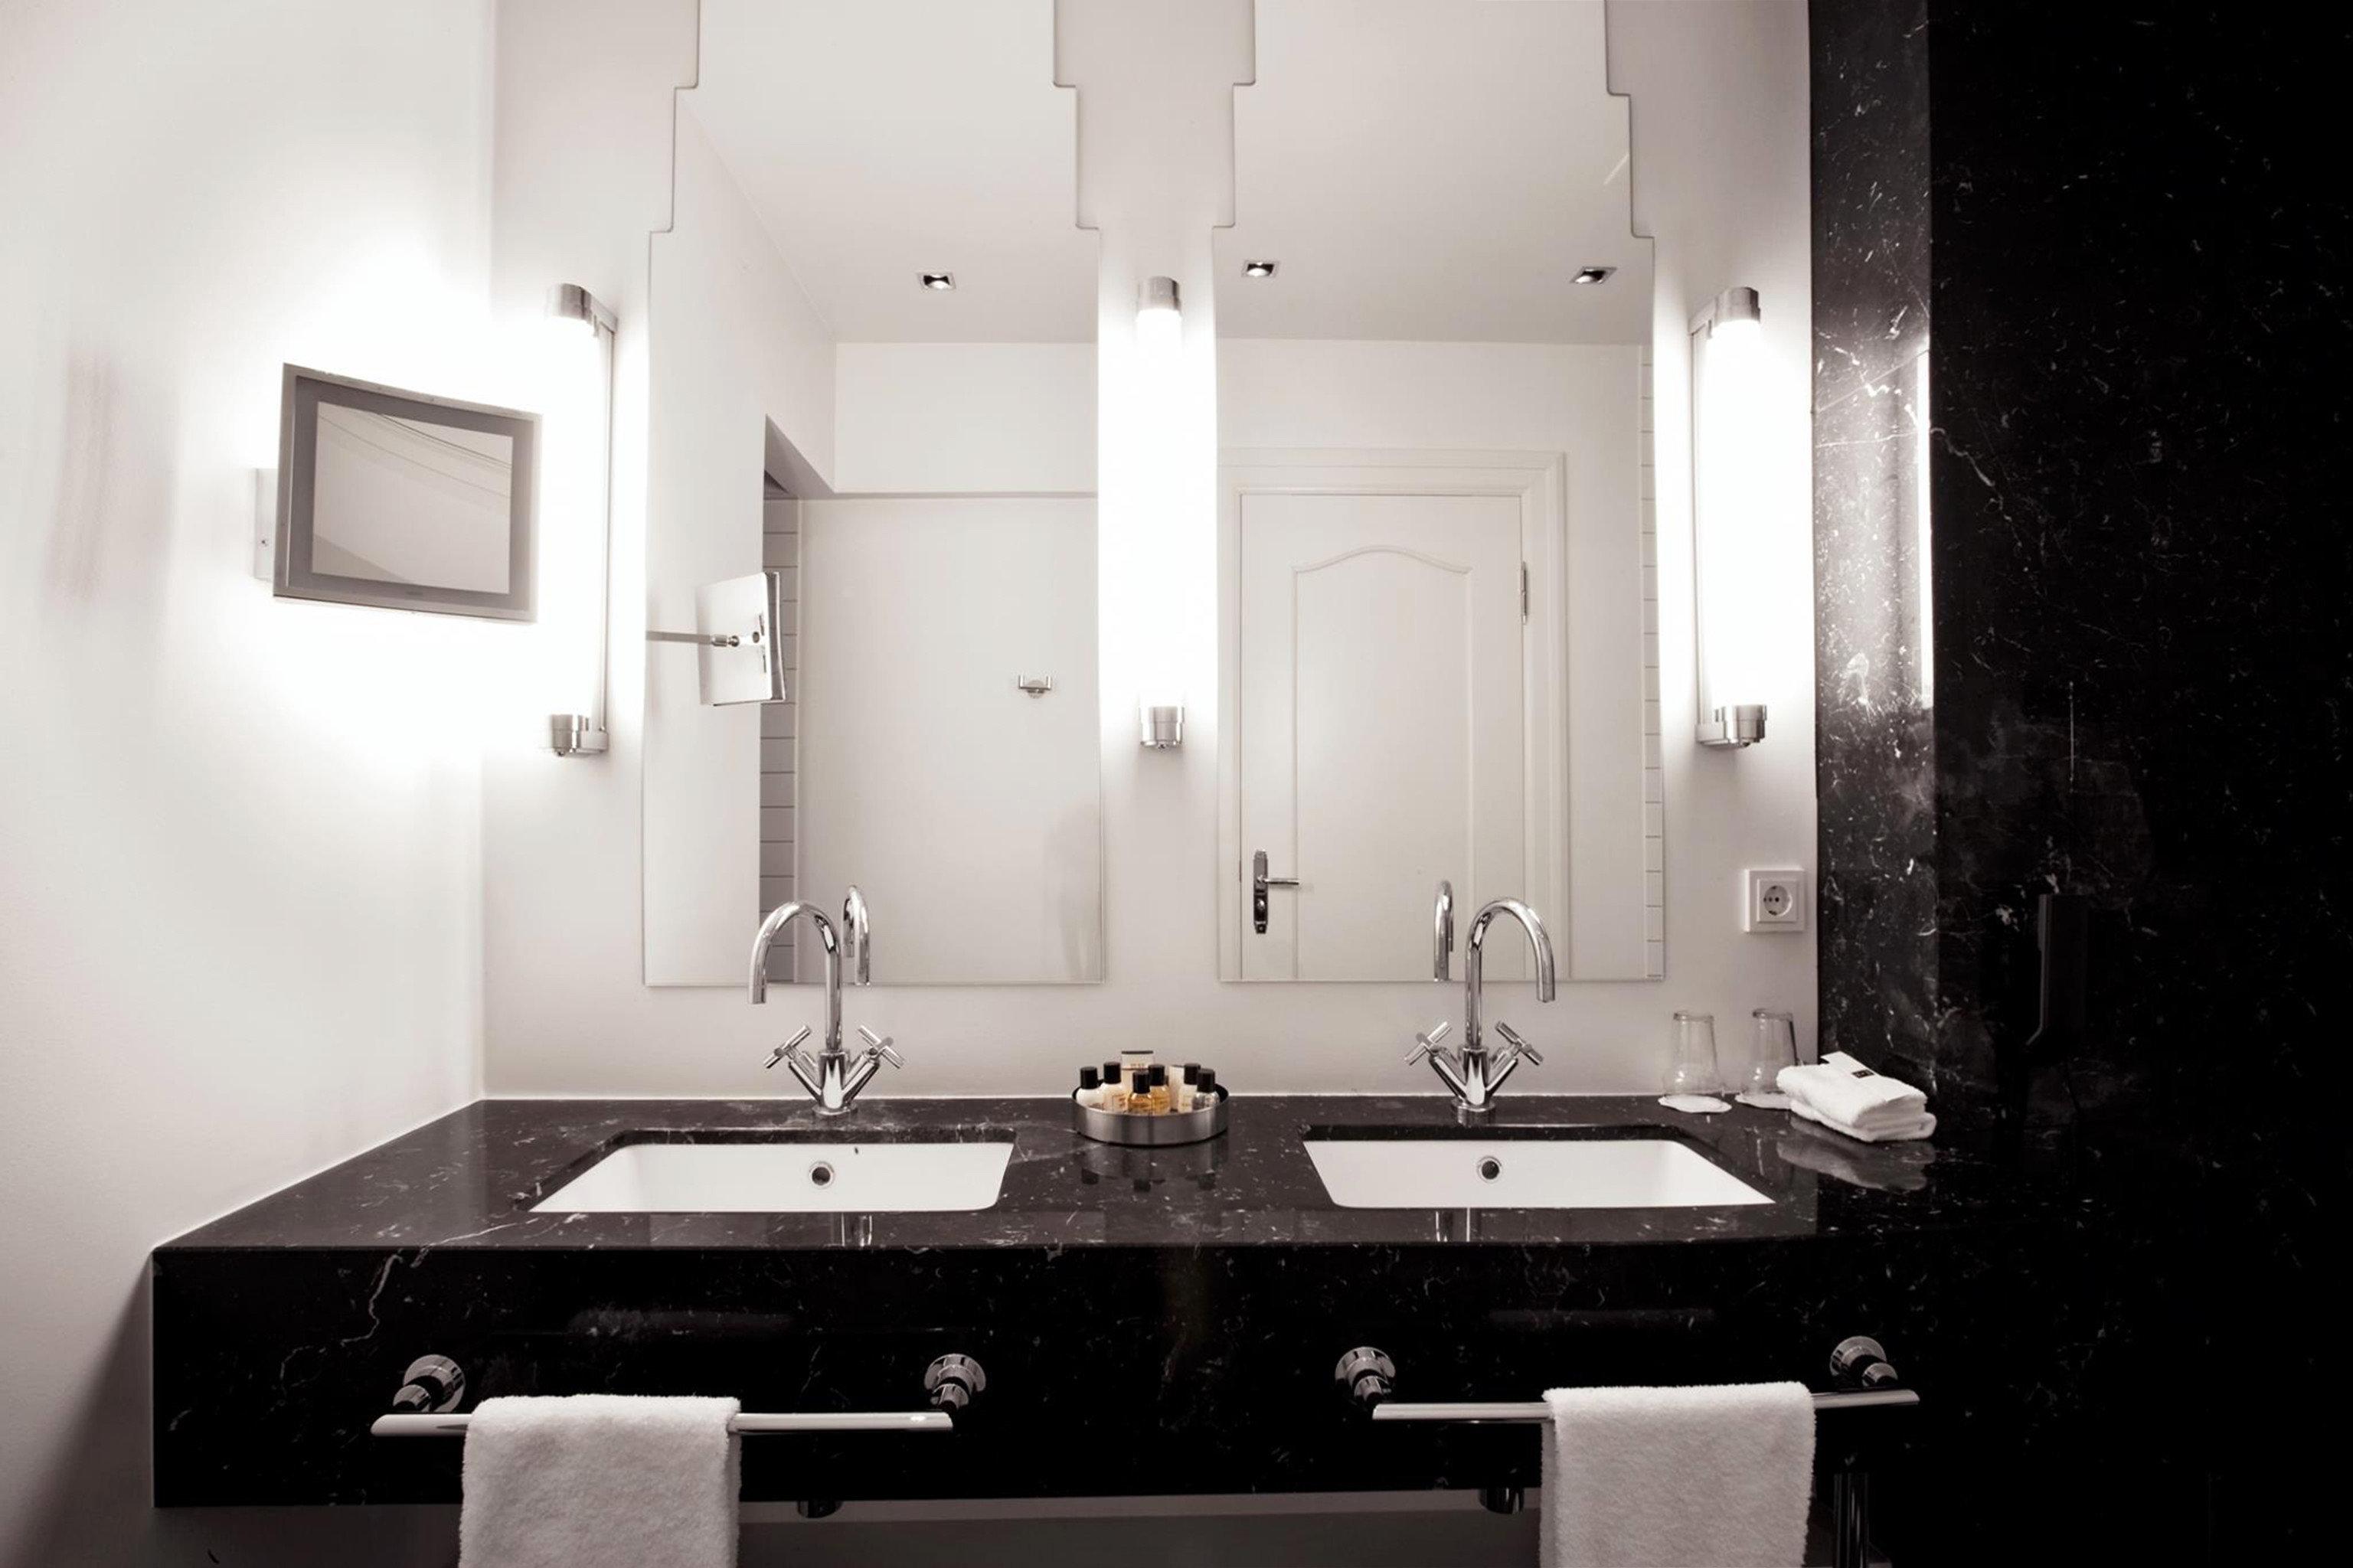 Bath Boutique Boutique Hotels Design Hotels Iceland Modern Reykjavík wall bathroom indoor white room mirror house sink home floor interior design lighting plumbing fixture estate toilet